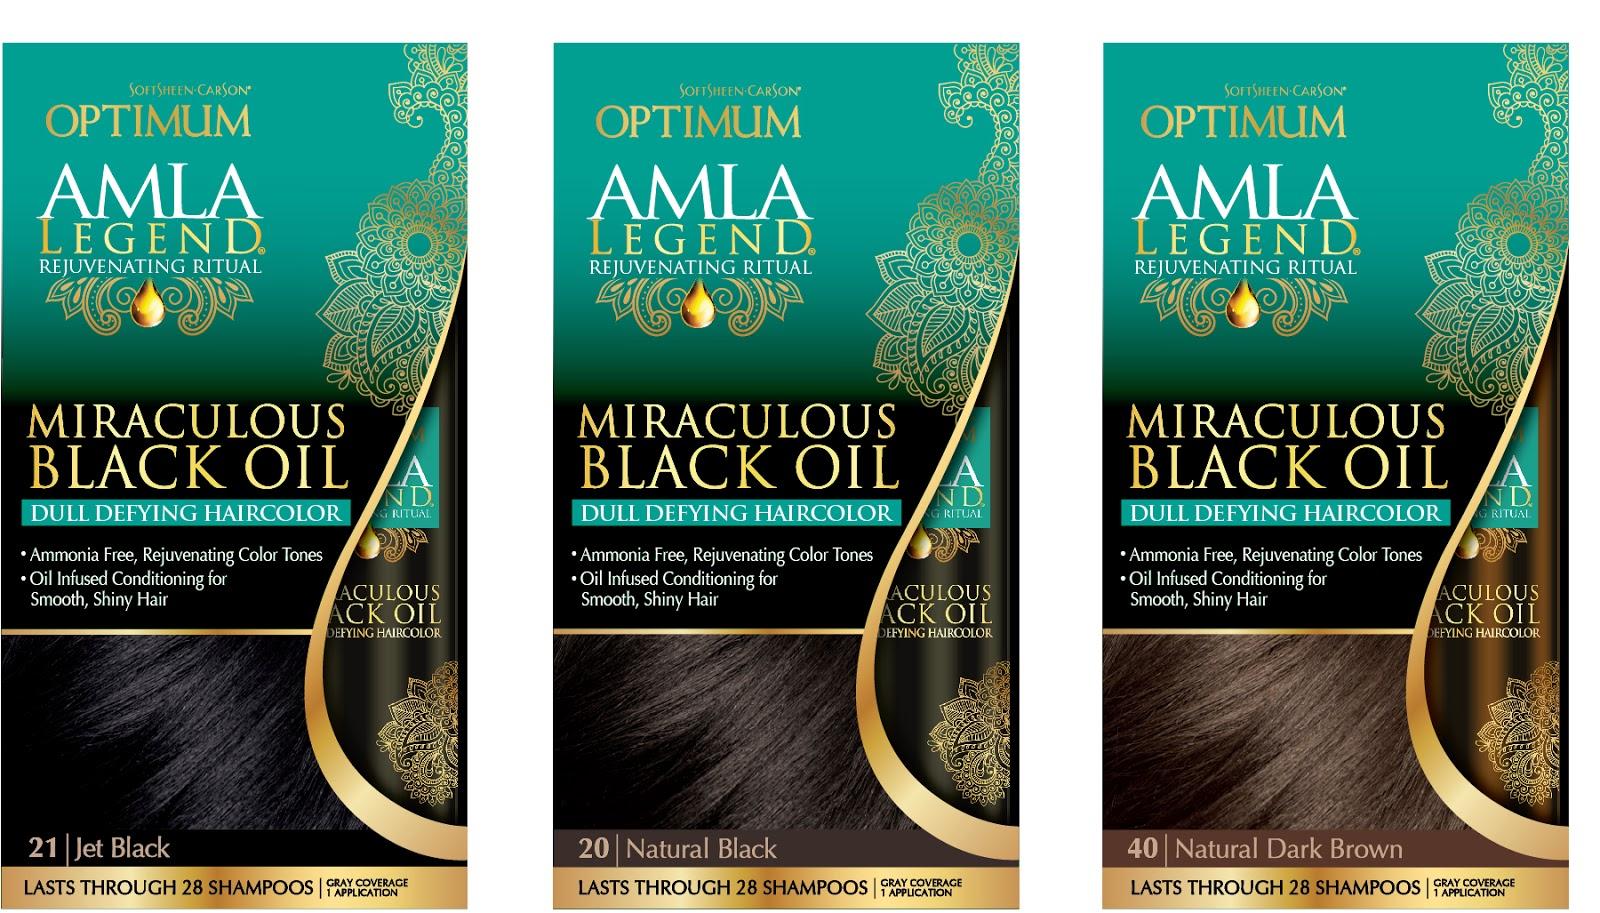 Optimum Amla Legend Miraculous Black Oil Hair Color ...